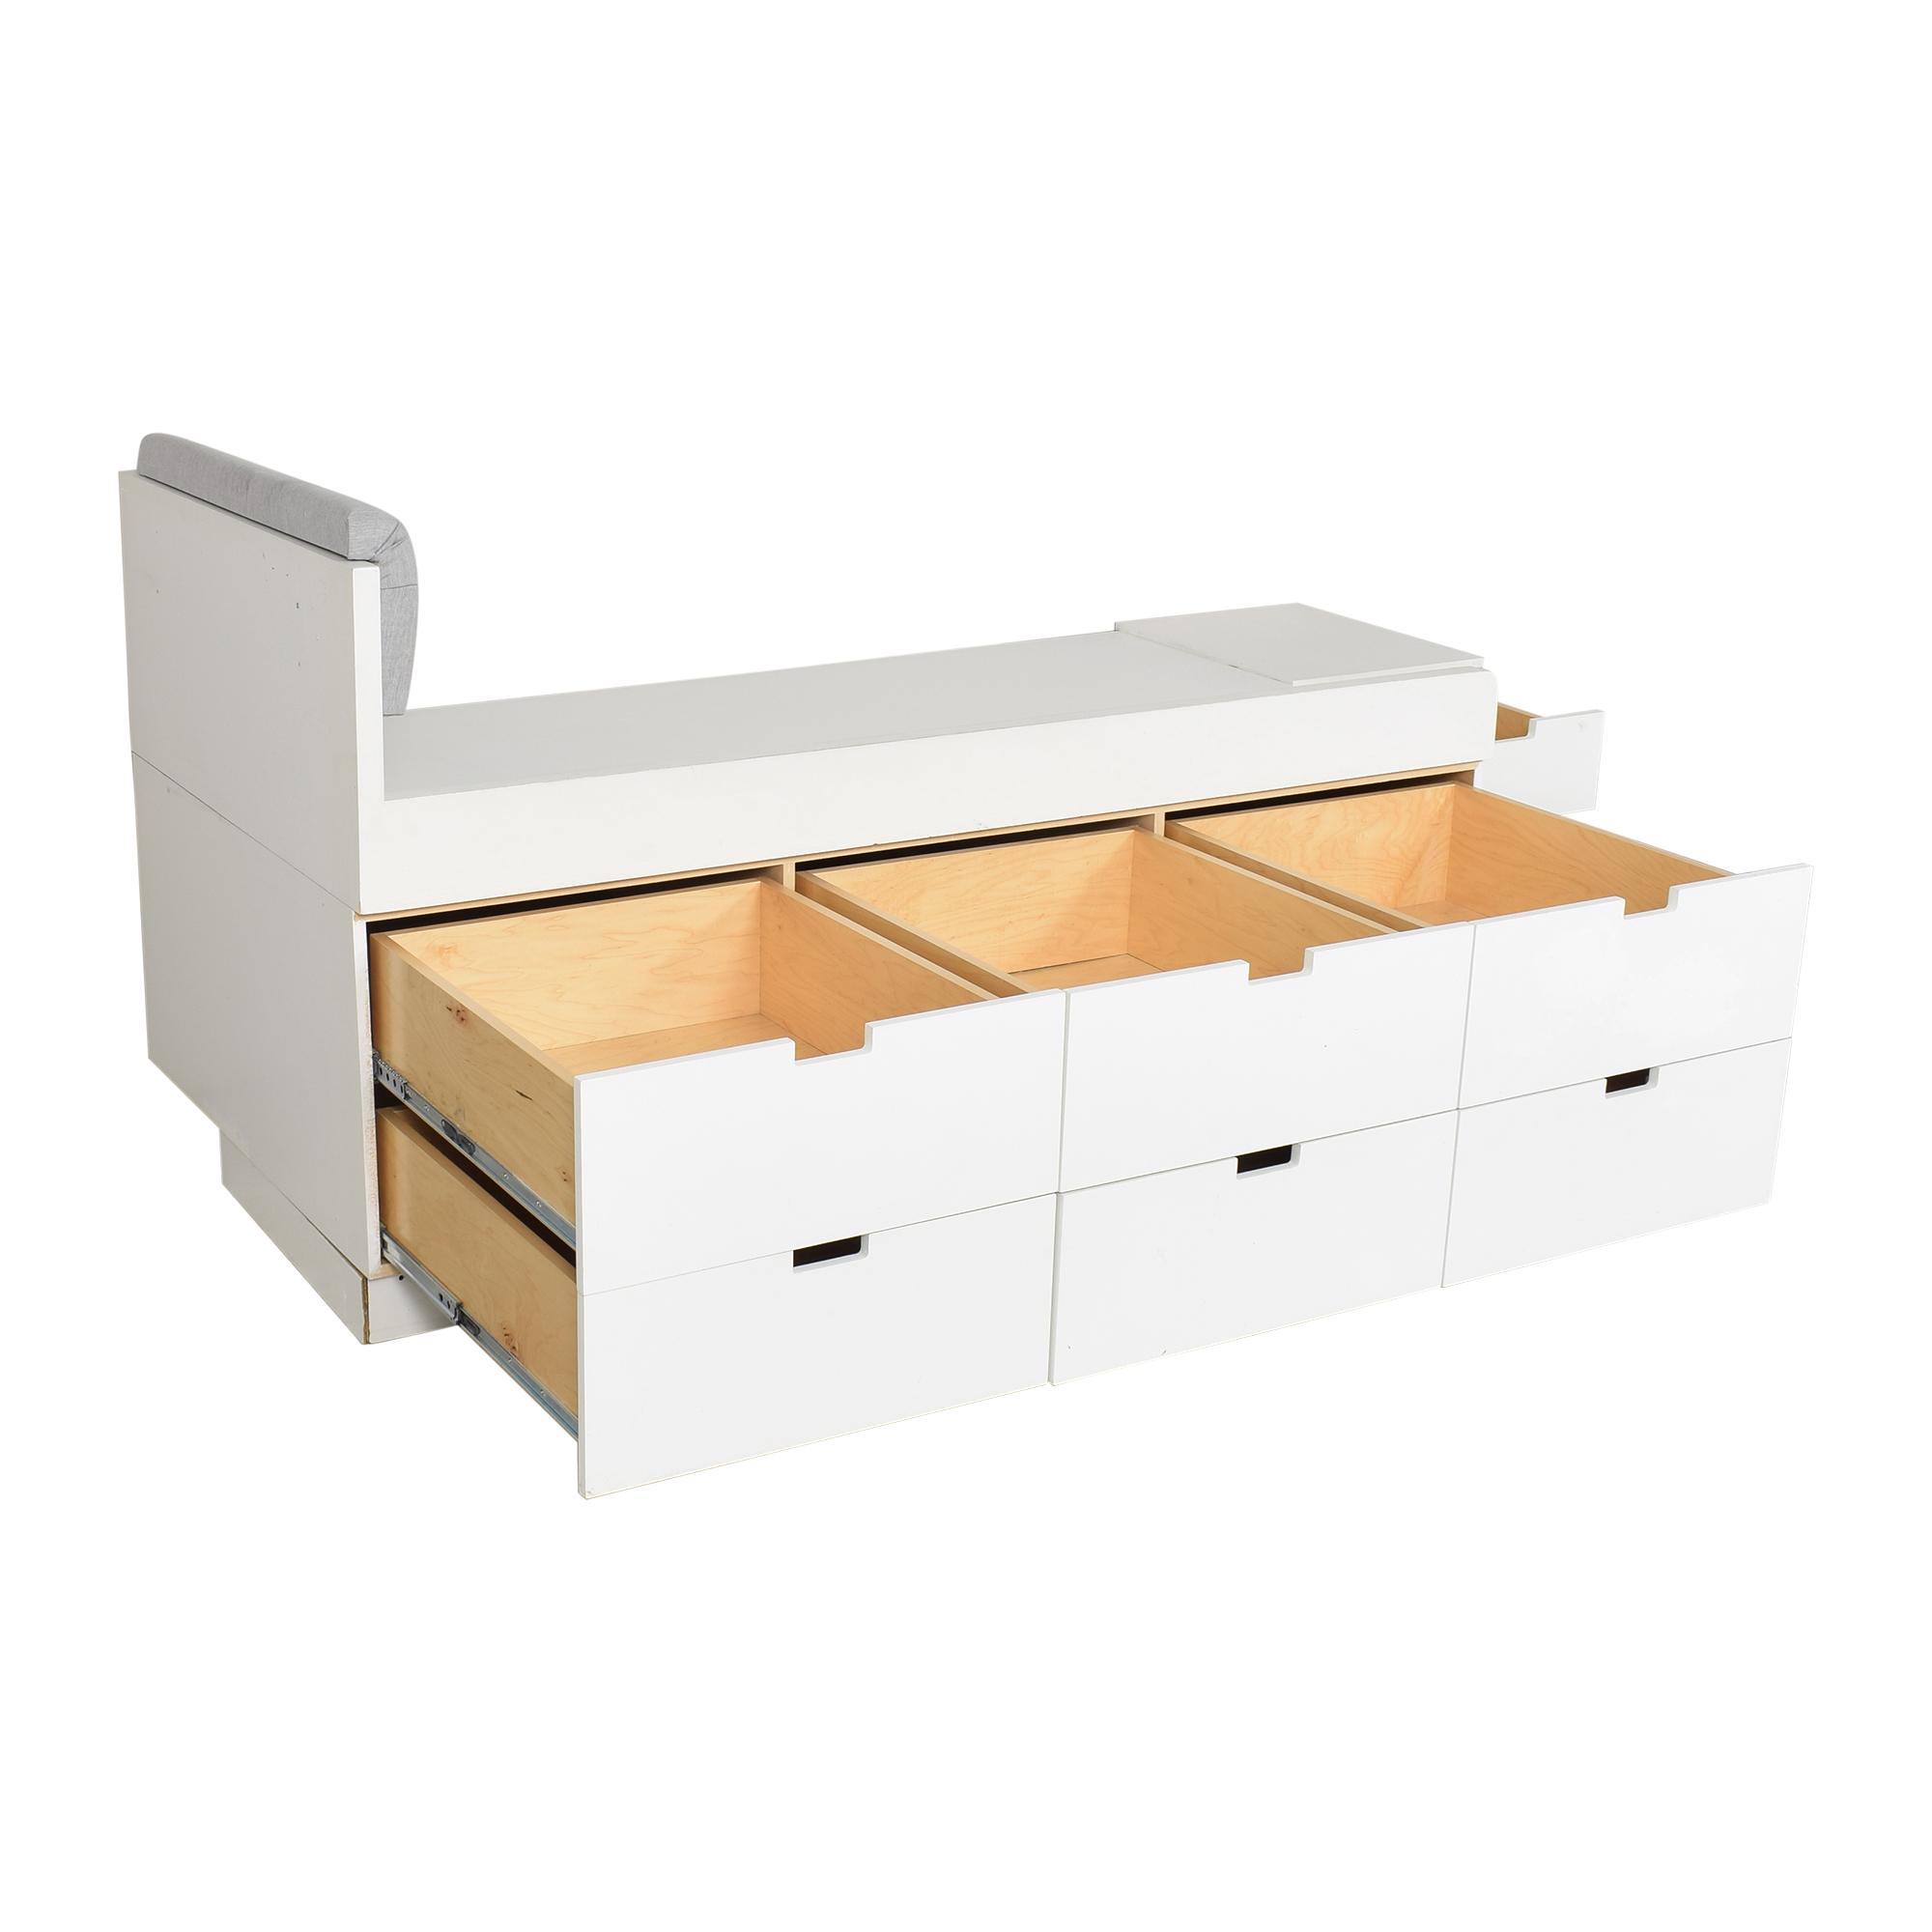 Gothic Cabinet Craft Gothic Cabinet Craft Custom Storage Twin Bed ma